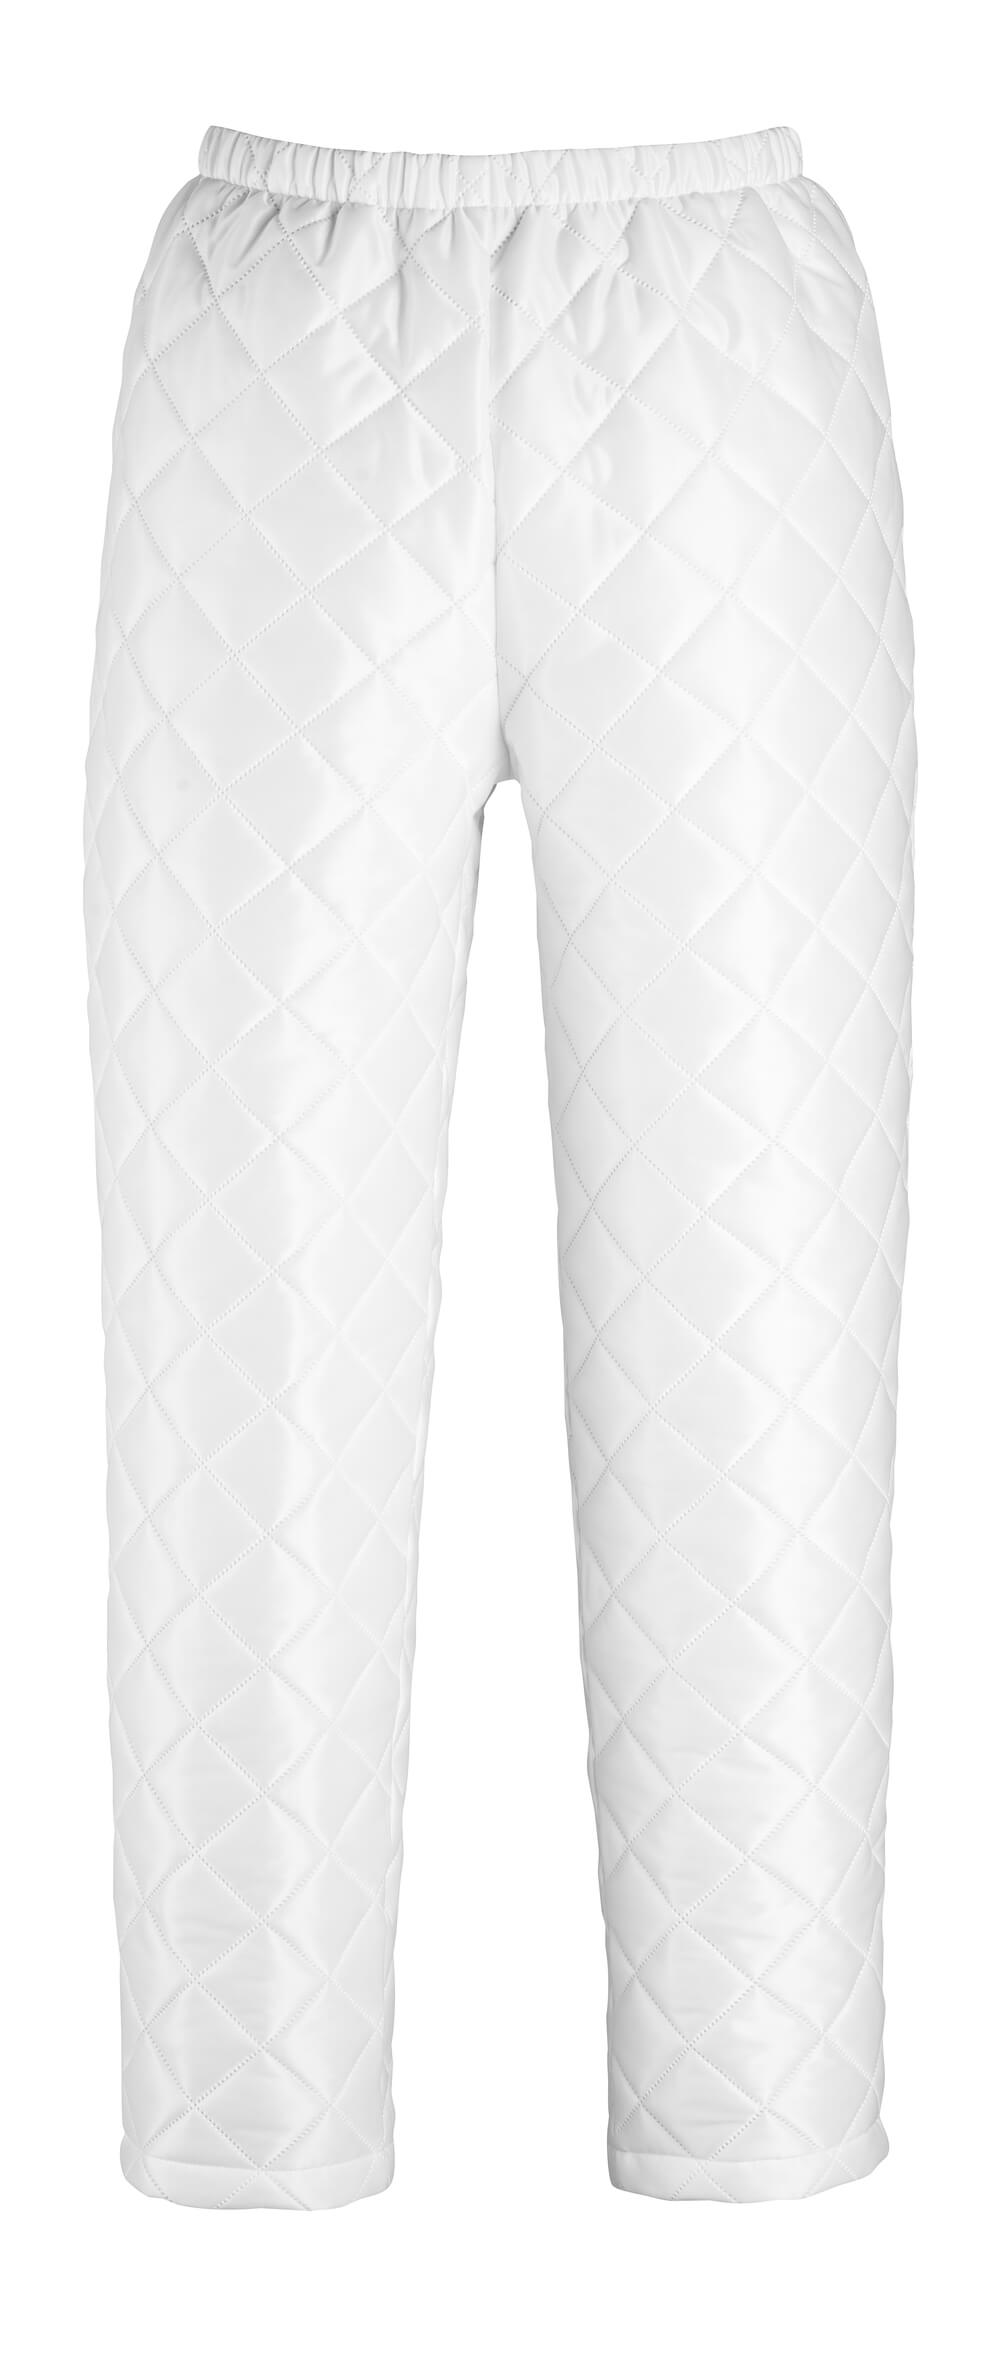 13578-707-06 Thermal Pants - white